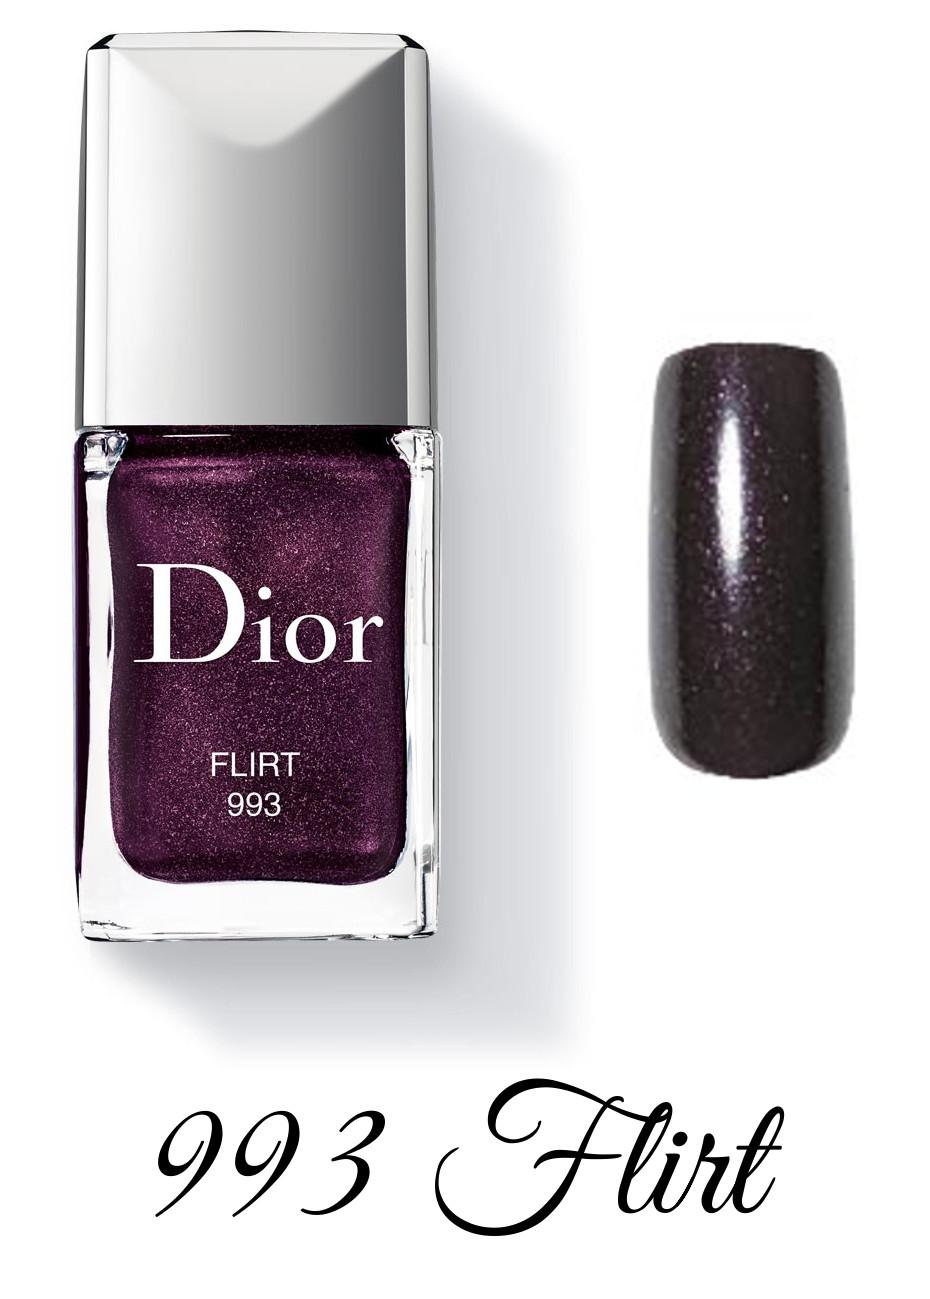 Dior Spring 2018 Collection GLOW ADDICT Dior Vernis 993 Flirt